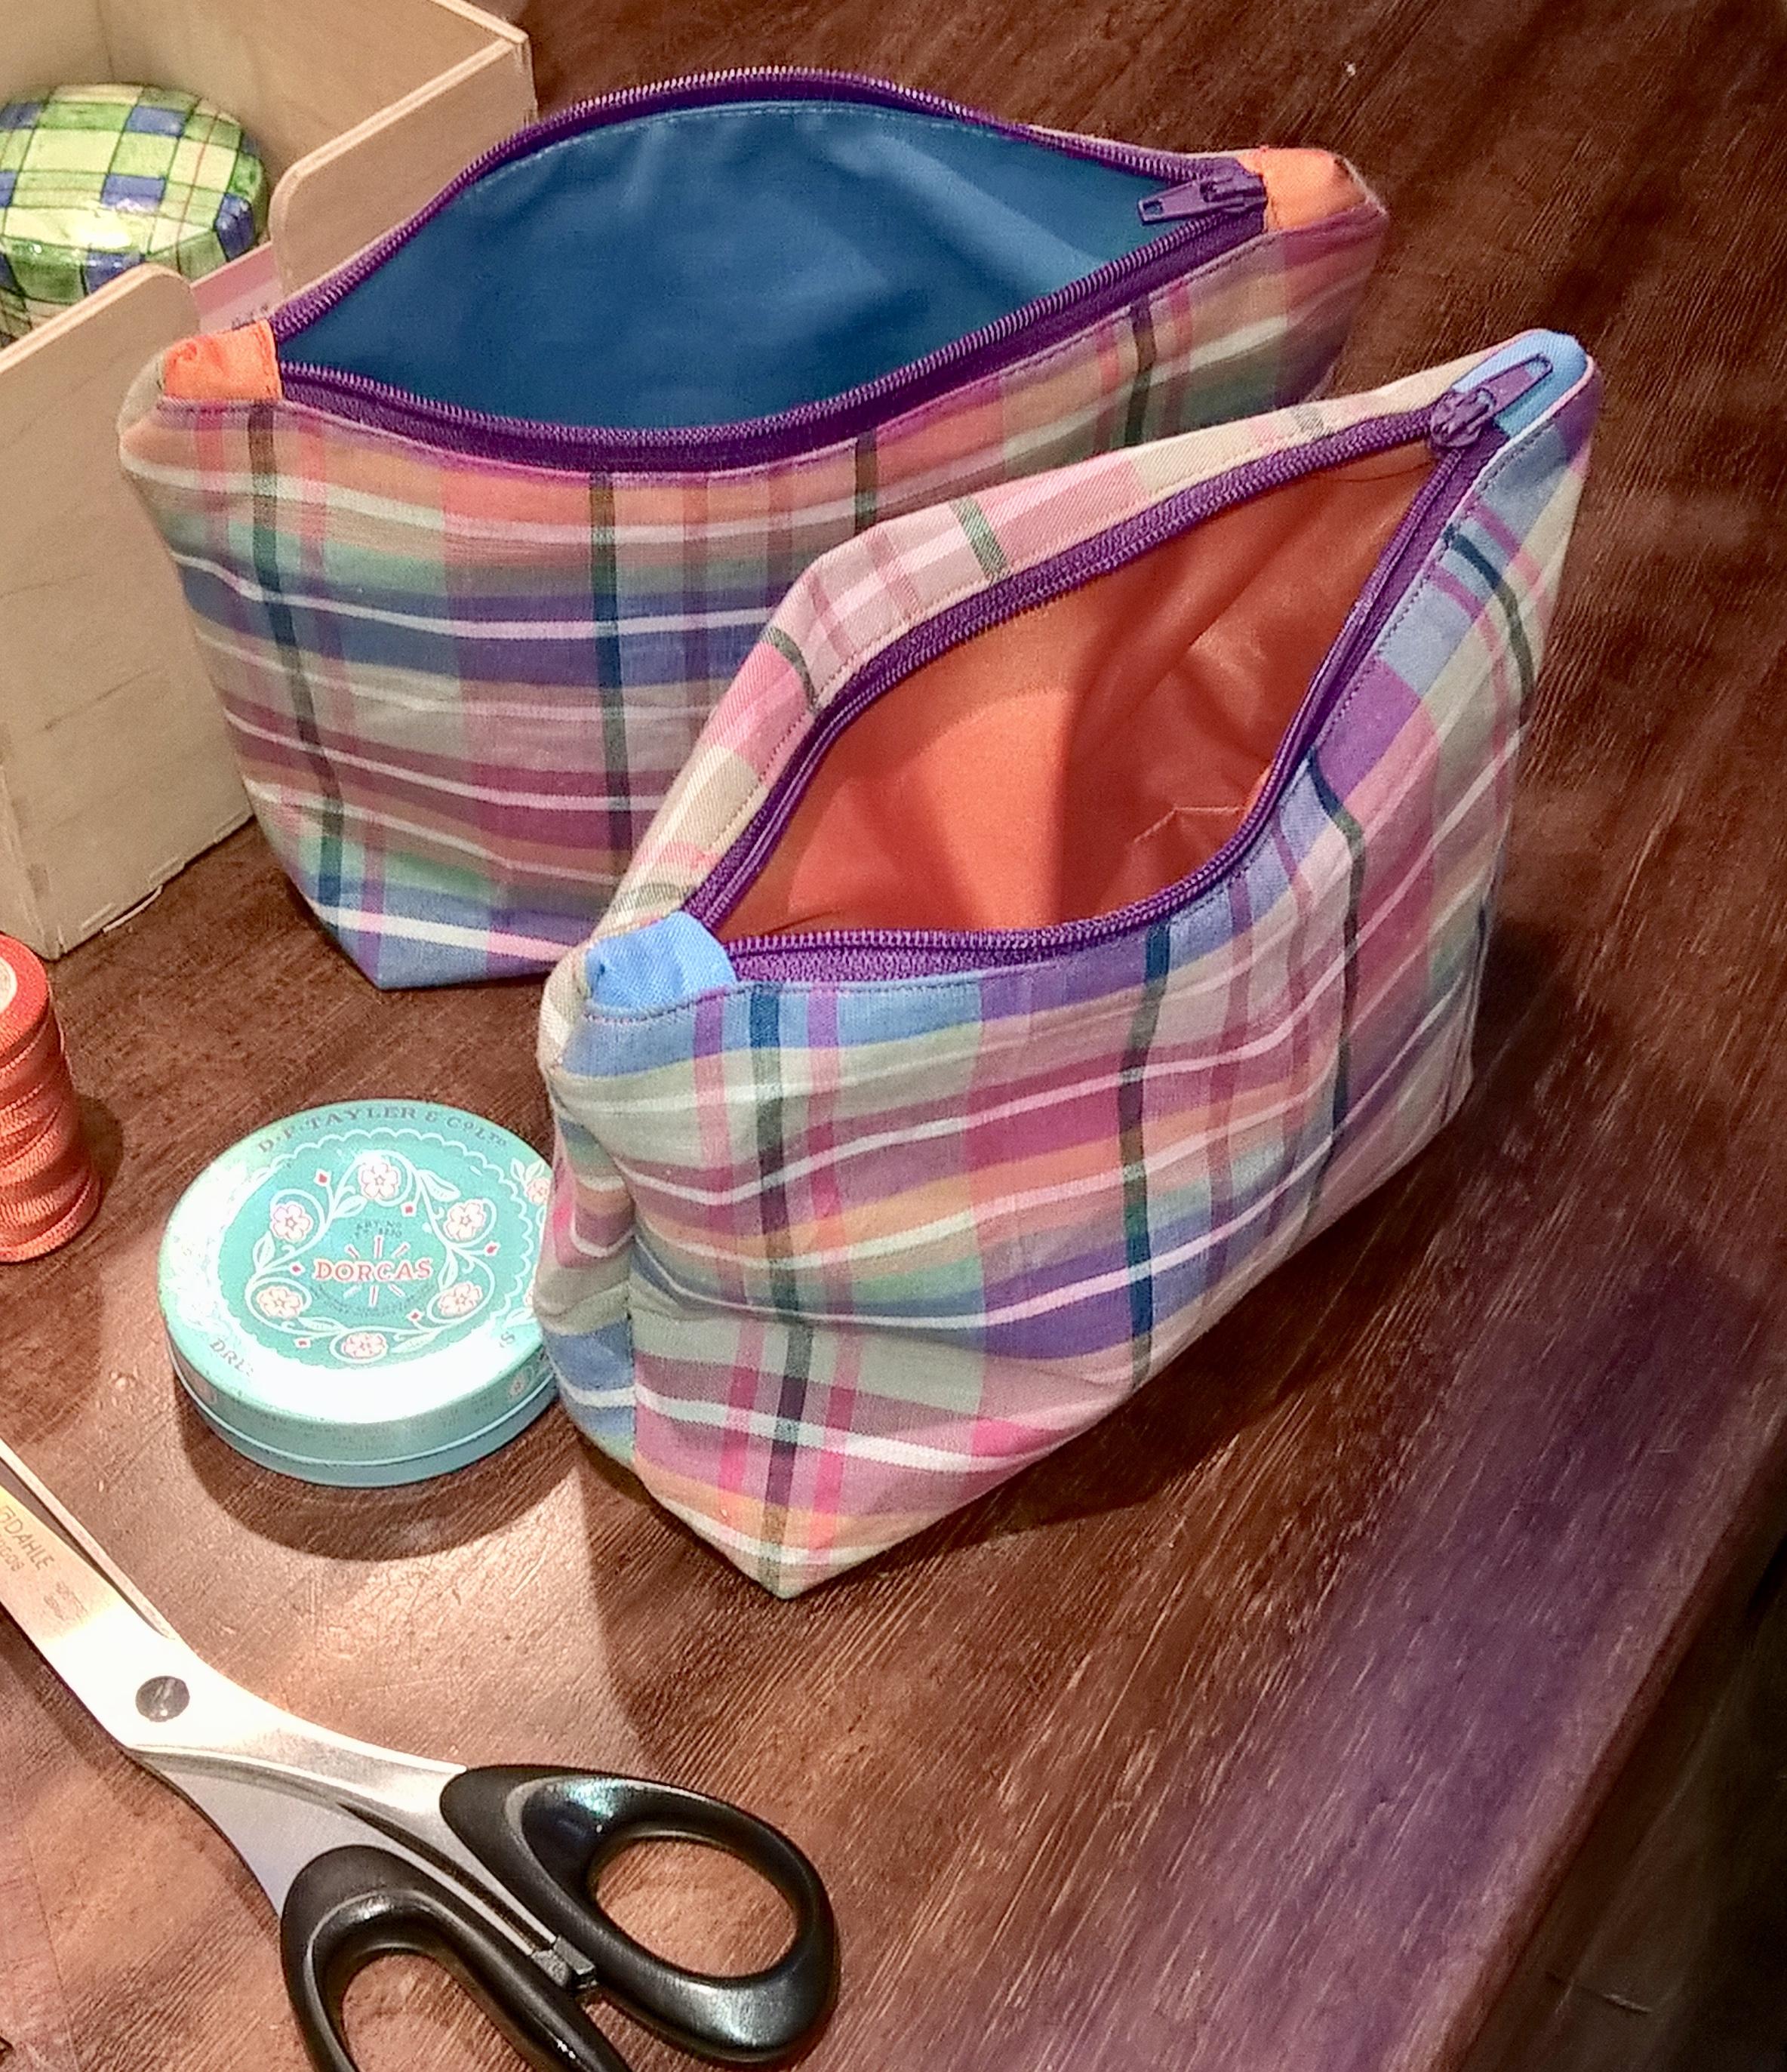 Sutura Sewing - Zip Purse workshop mentored by Annabelle  Davis